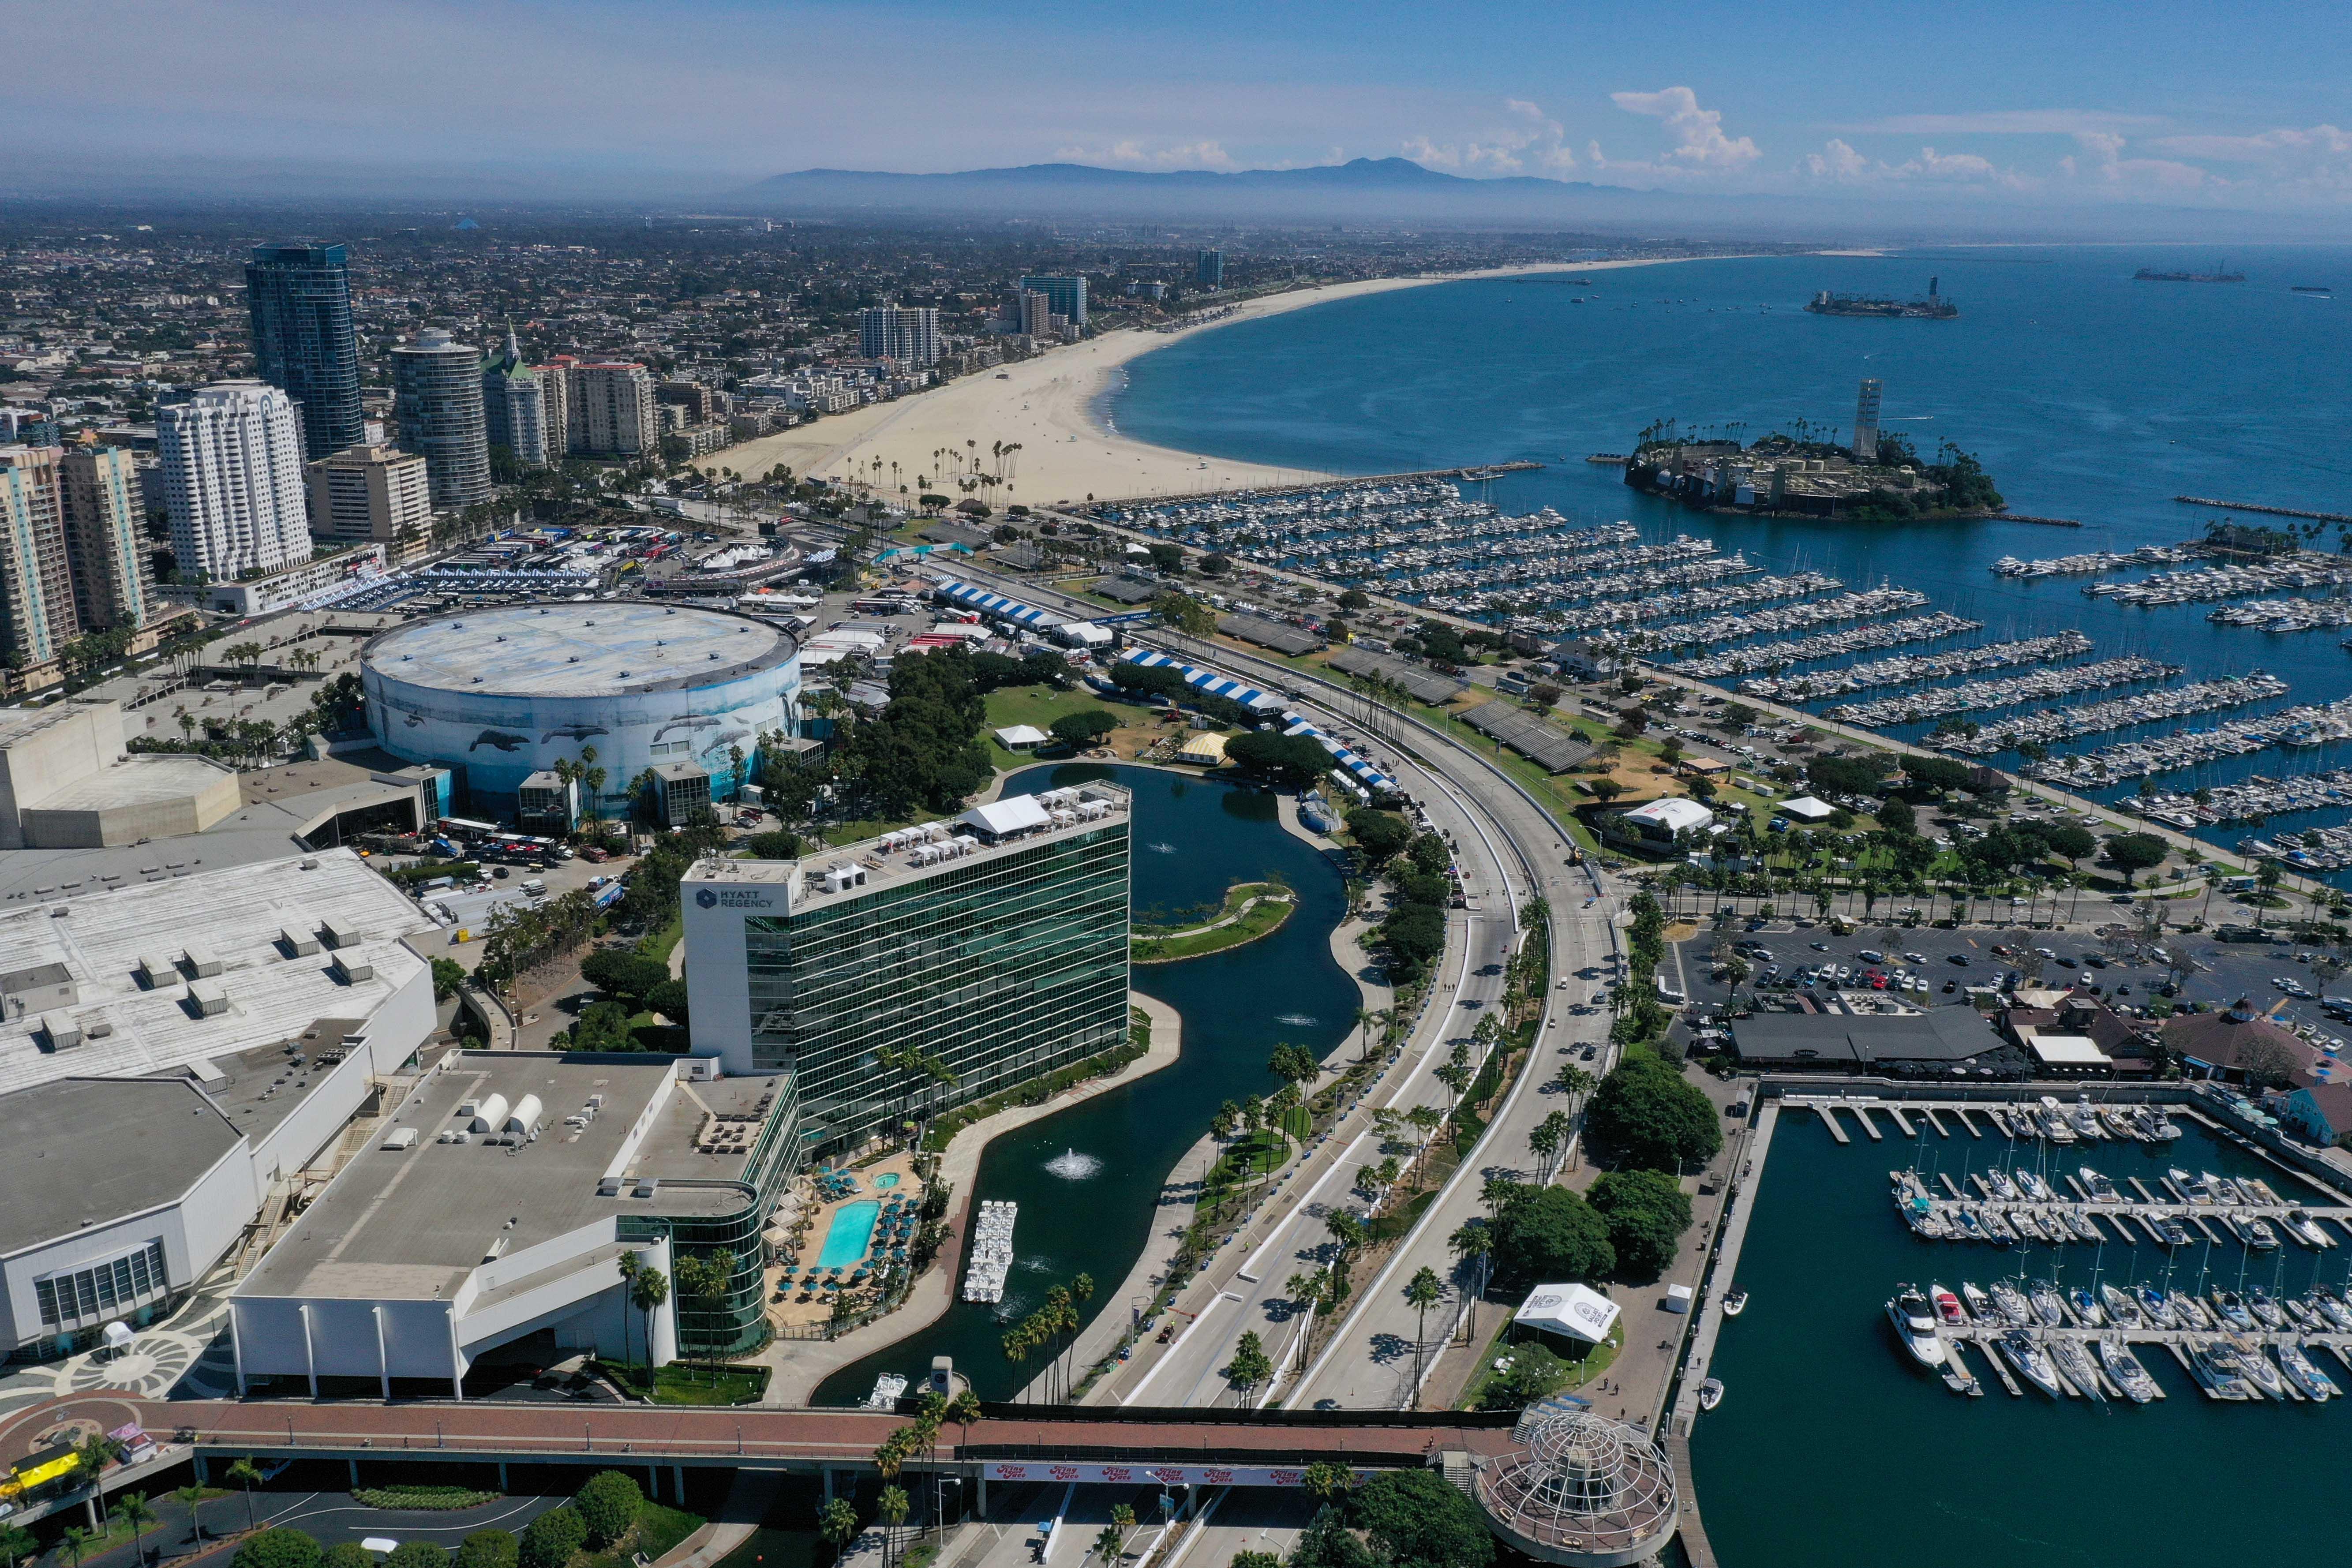 Grand Prix of Long Beach - Indycar Series - Aerial Photo